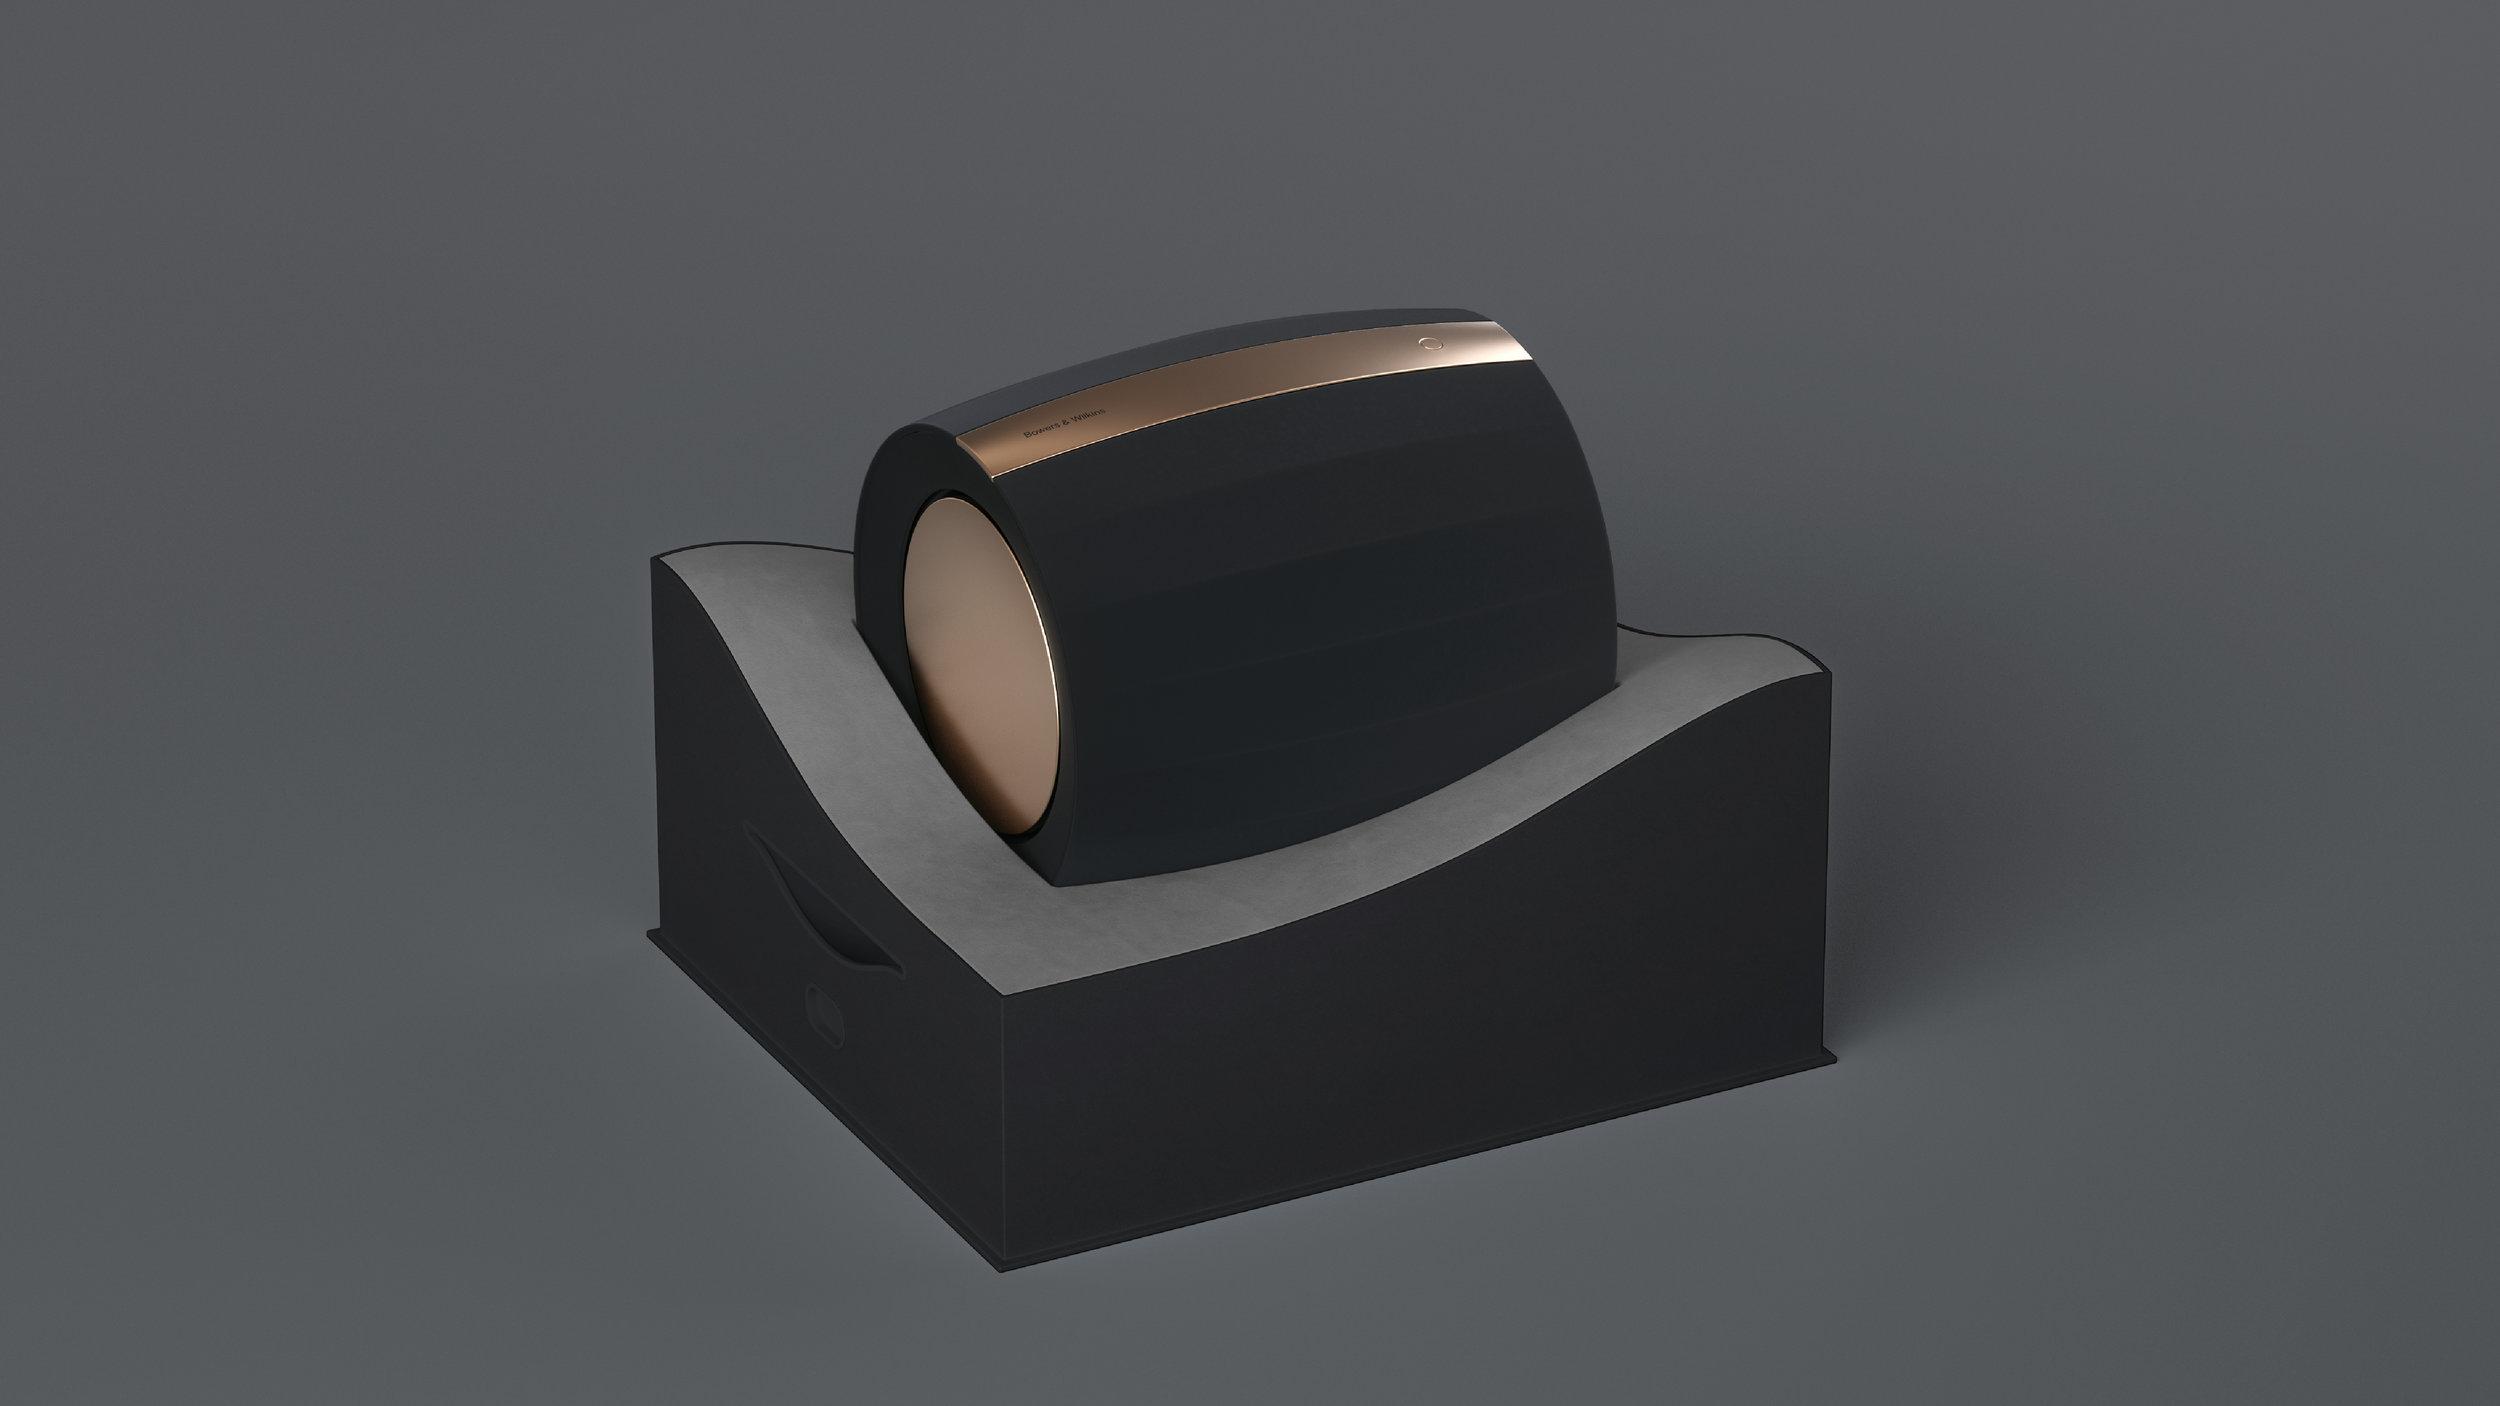 B&W_LibertySuite_PackagingStructure_R115.jpg